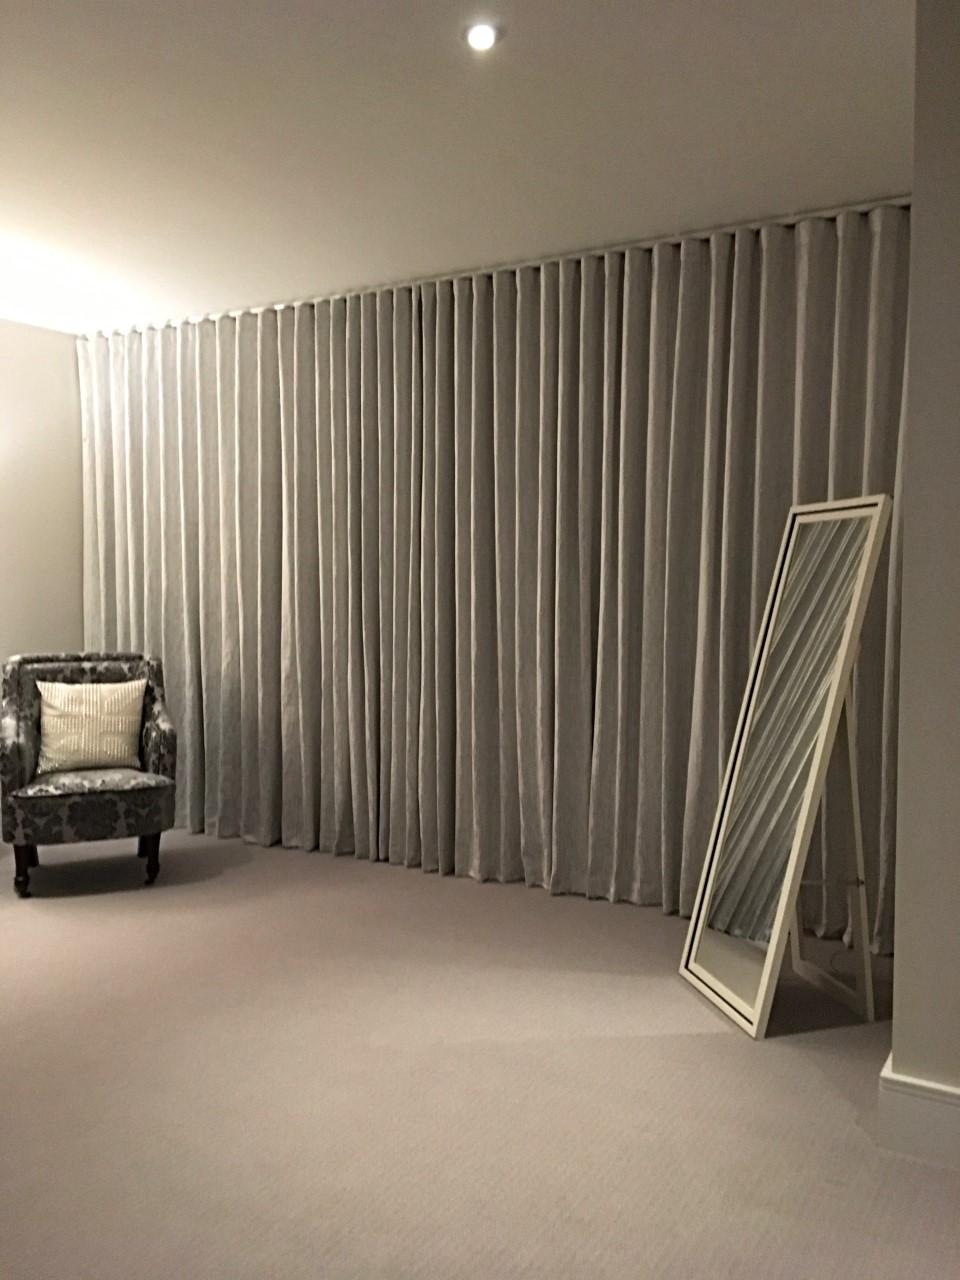 Wave Headed Floor to Ceiling Curtains. Xander Collection by Villa Nova Fabrics